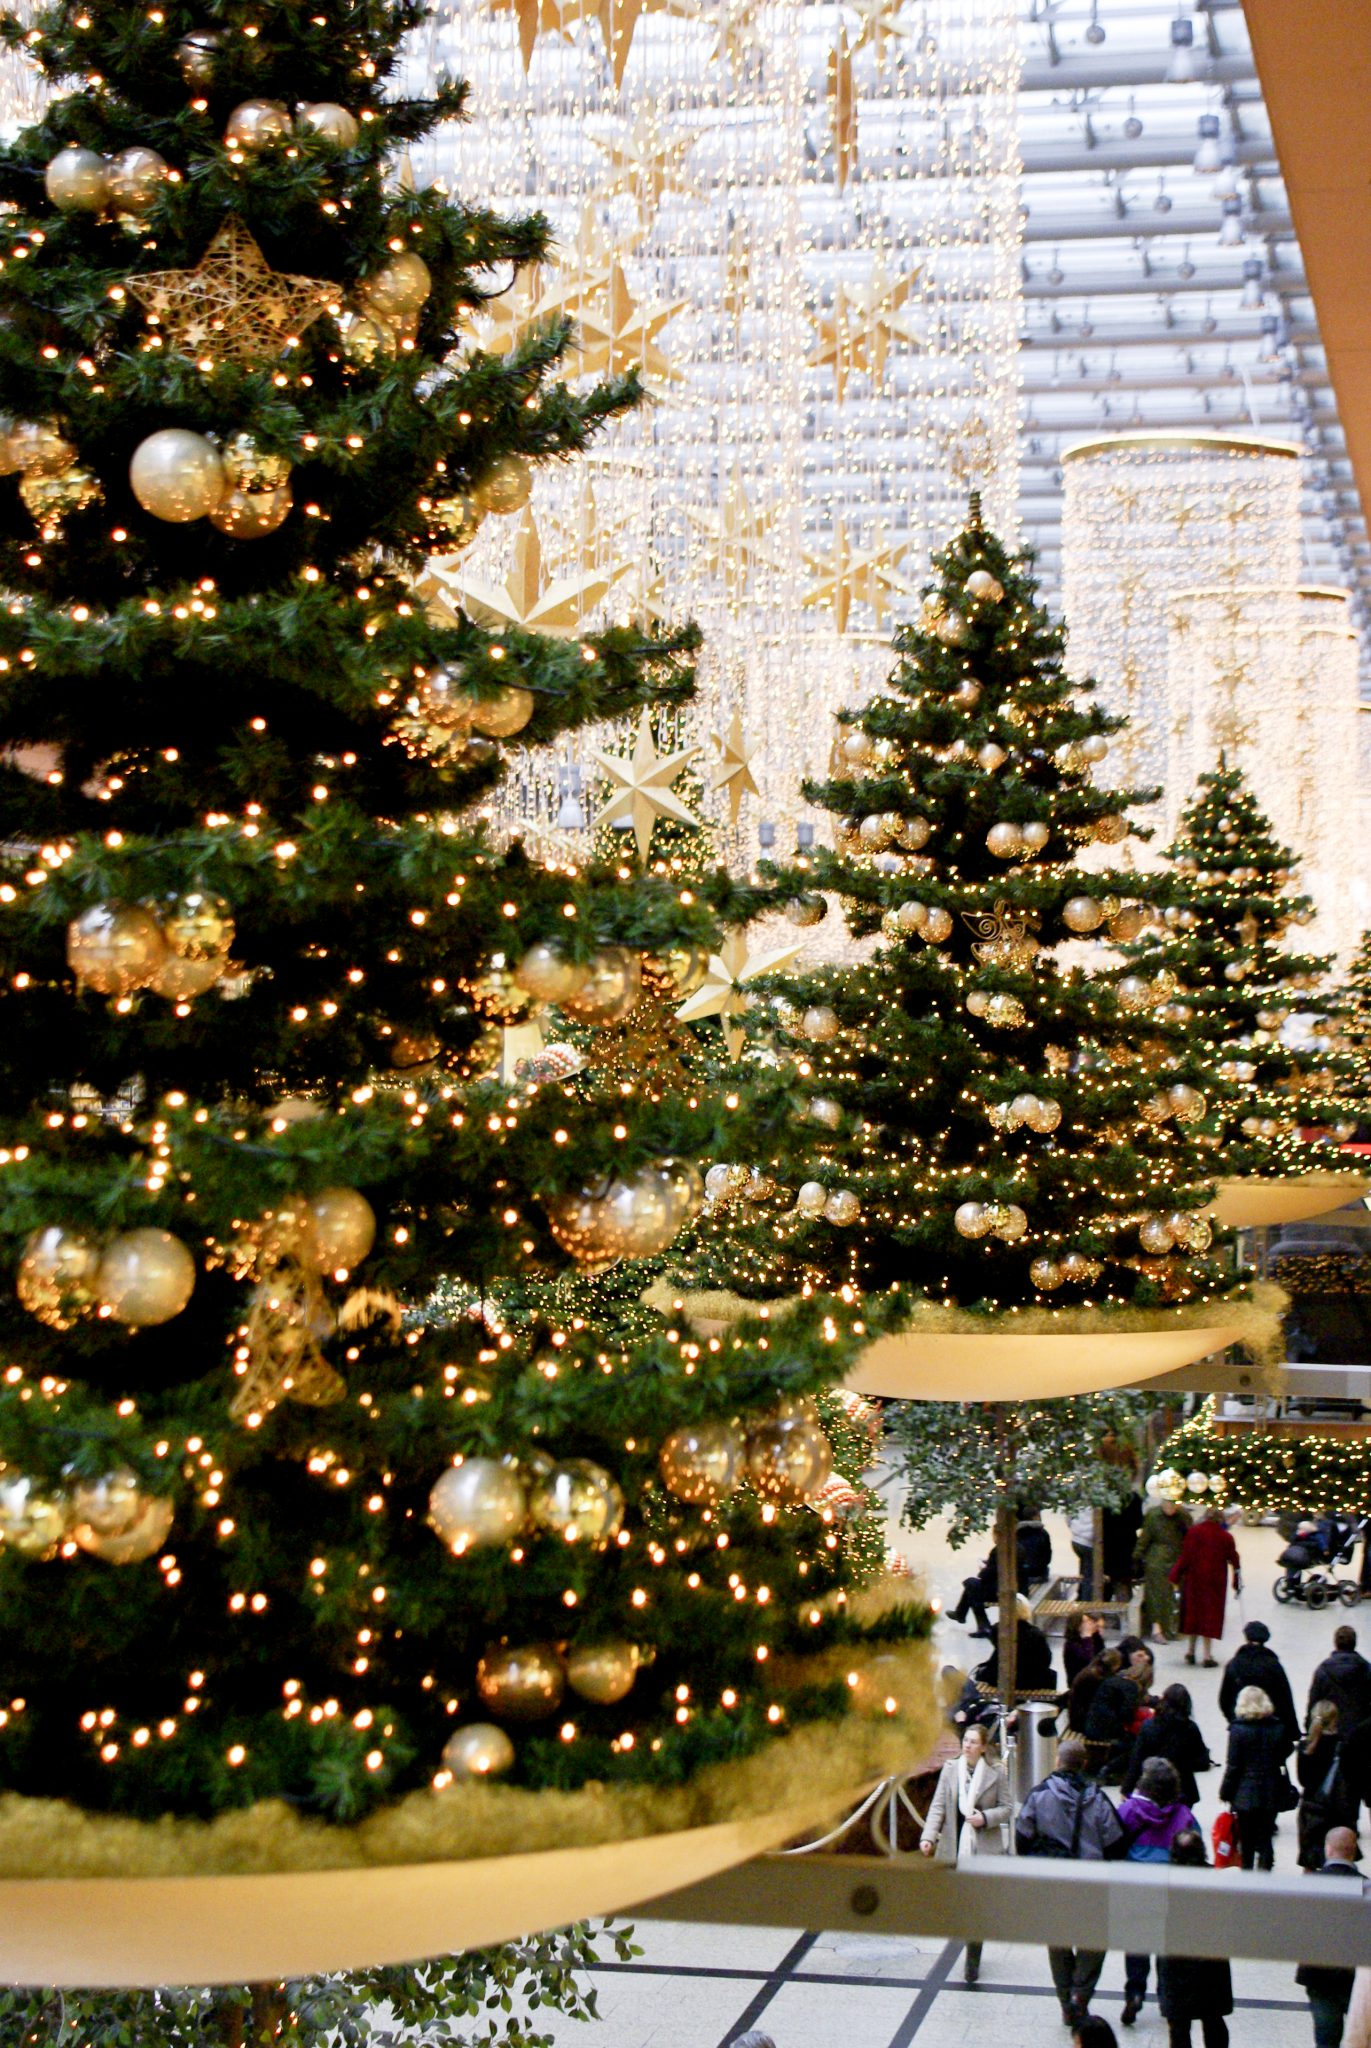 Shopping centre Christmas trees